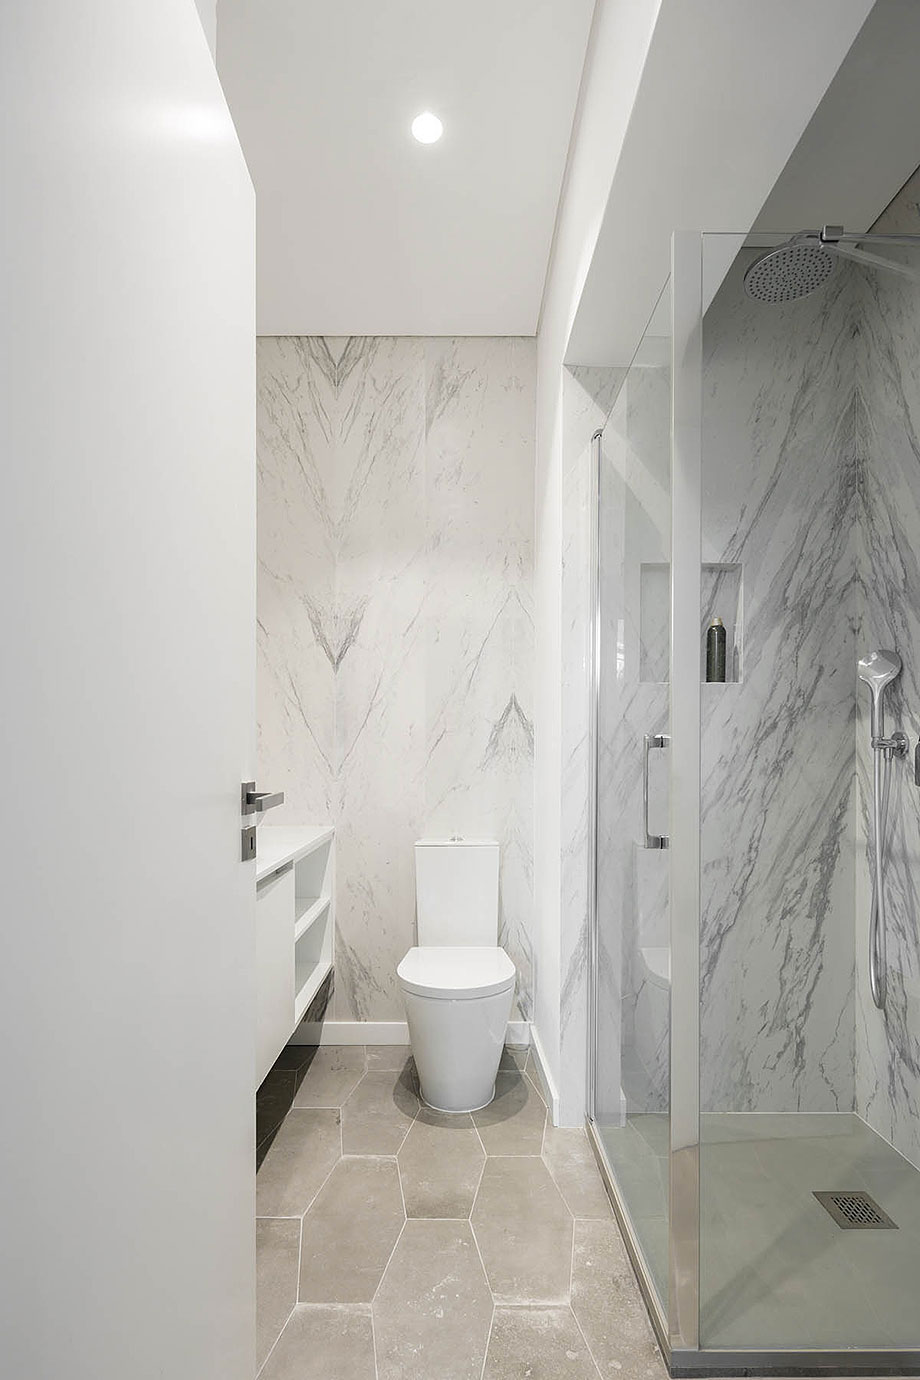 apartamento en oporto por paulo moreira architectures (16) - foto ivo tavares